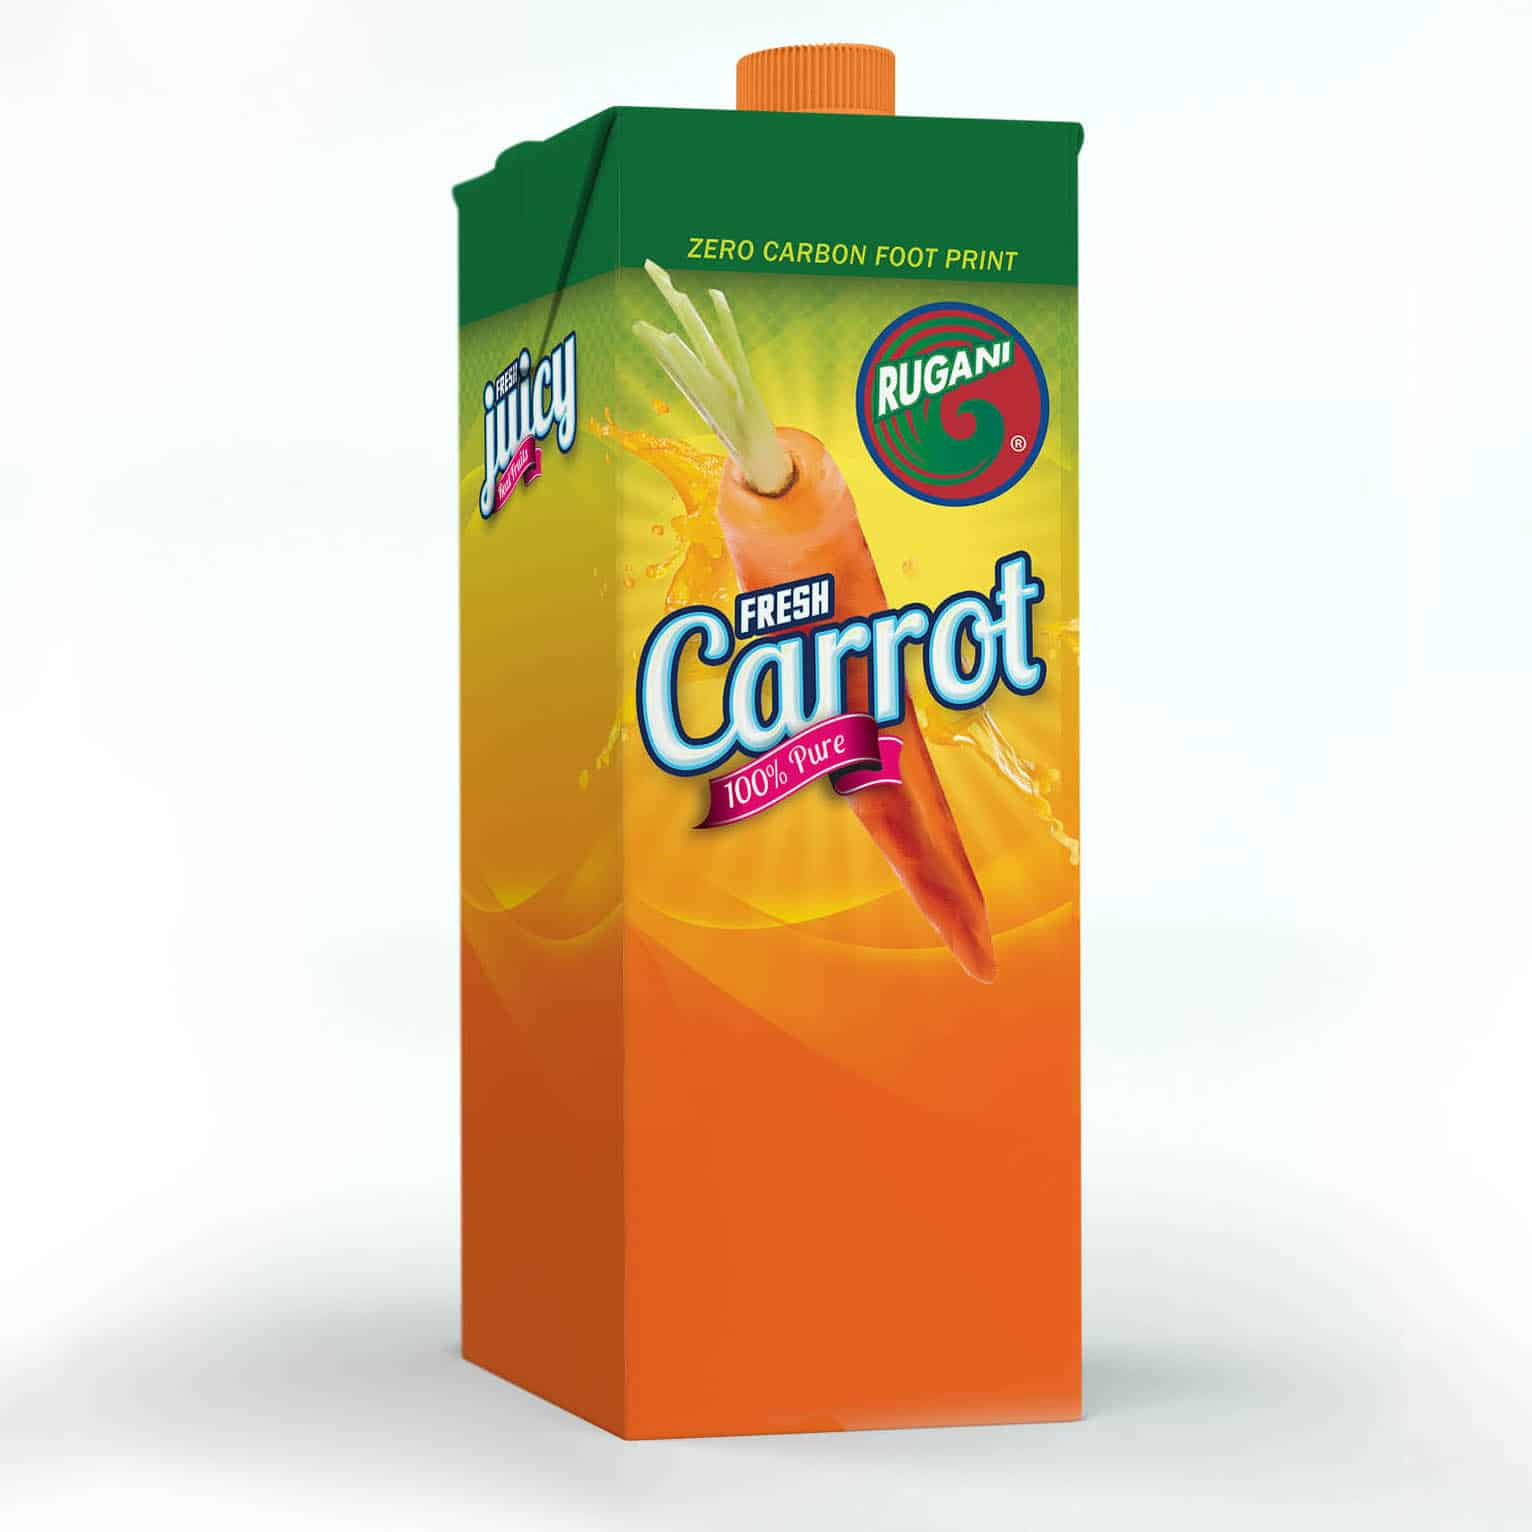 Rugani Carrot Juice Concept Art